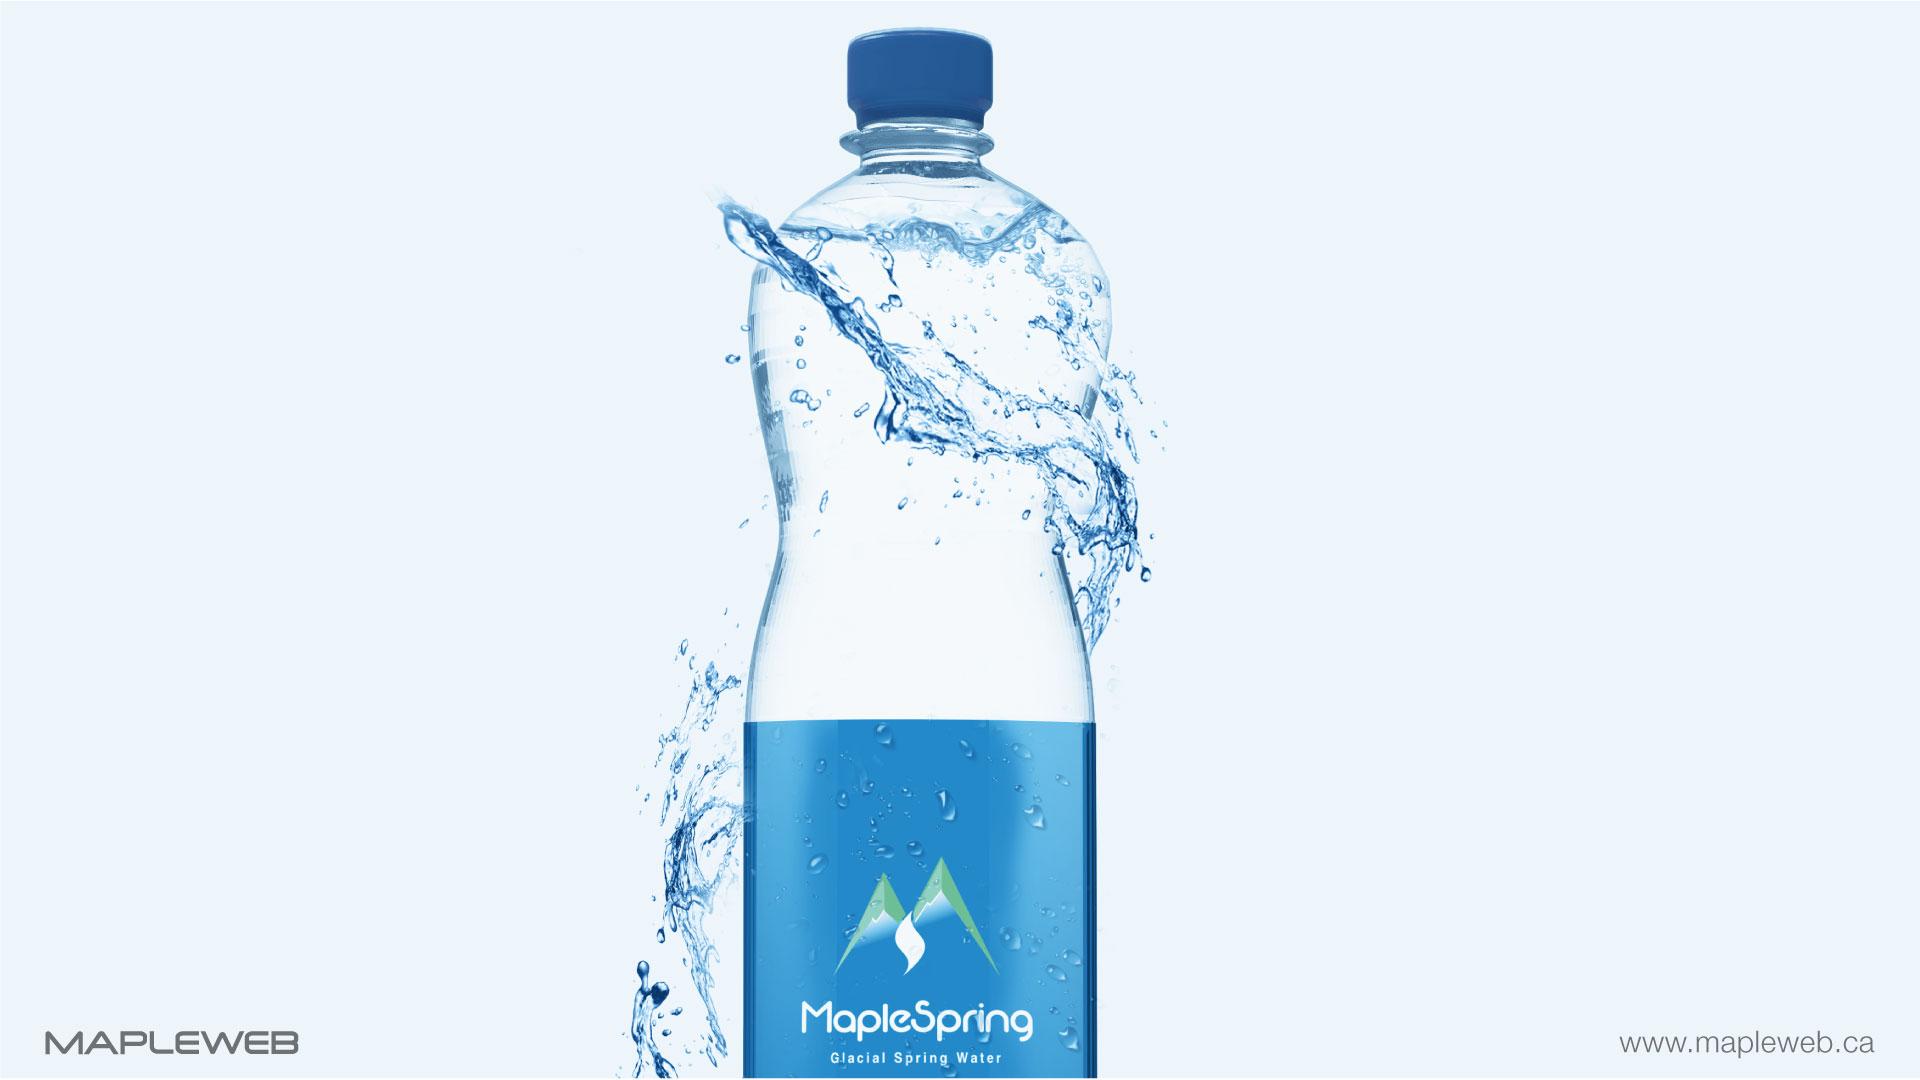 maplespring-brand-logo-design-by-mapleweb-vancouver-canada-water-bottle-splash-mock